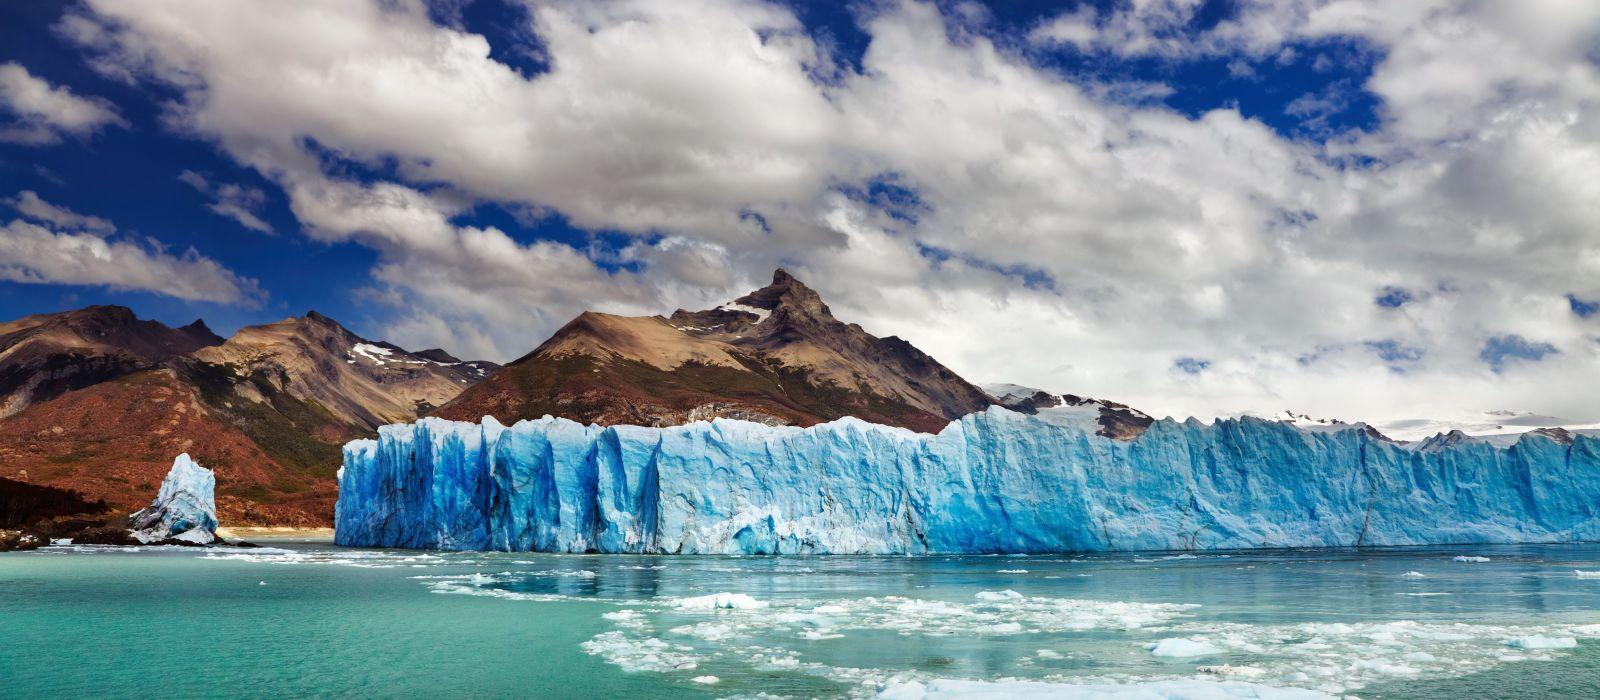 Glaciers, Wildlife & Waterfalls in Argentina Tour Trip 1